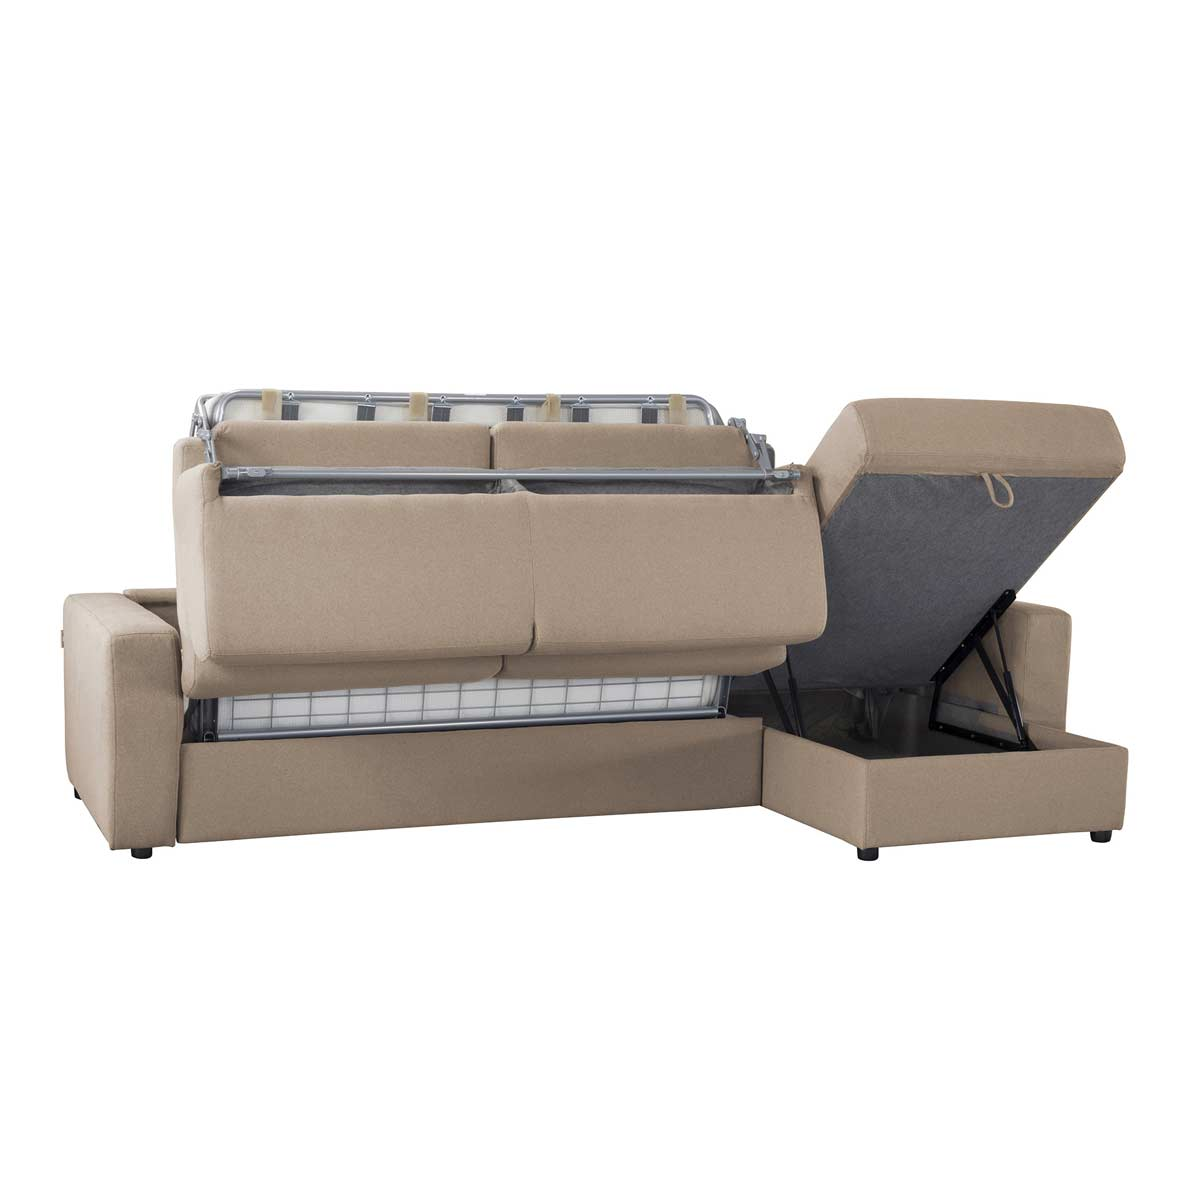 canap d 39 angle convertible r versible en tissu coton pas cher. Black Bedroom Furniture Sets. Home Design Ideas